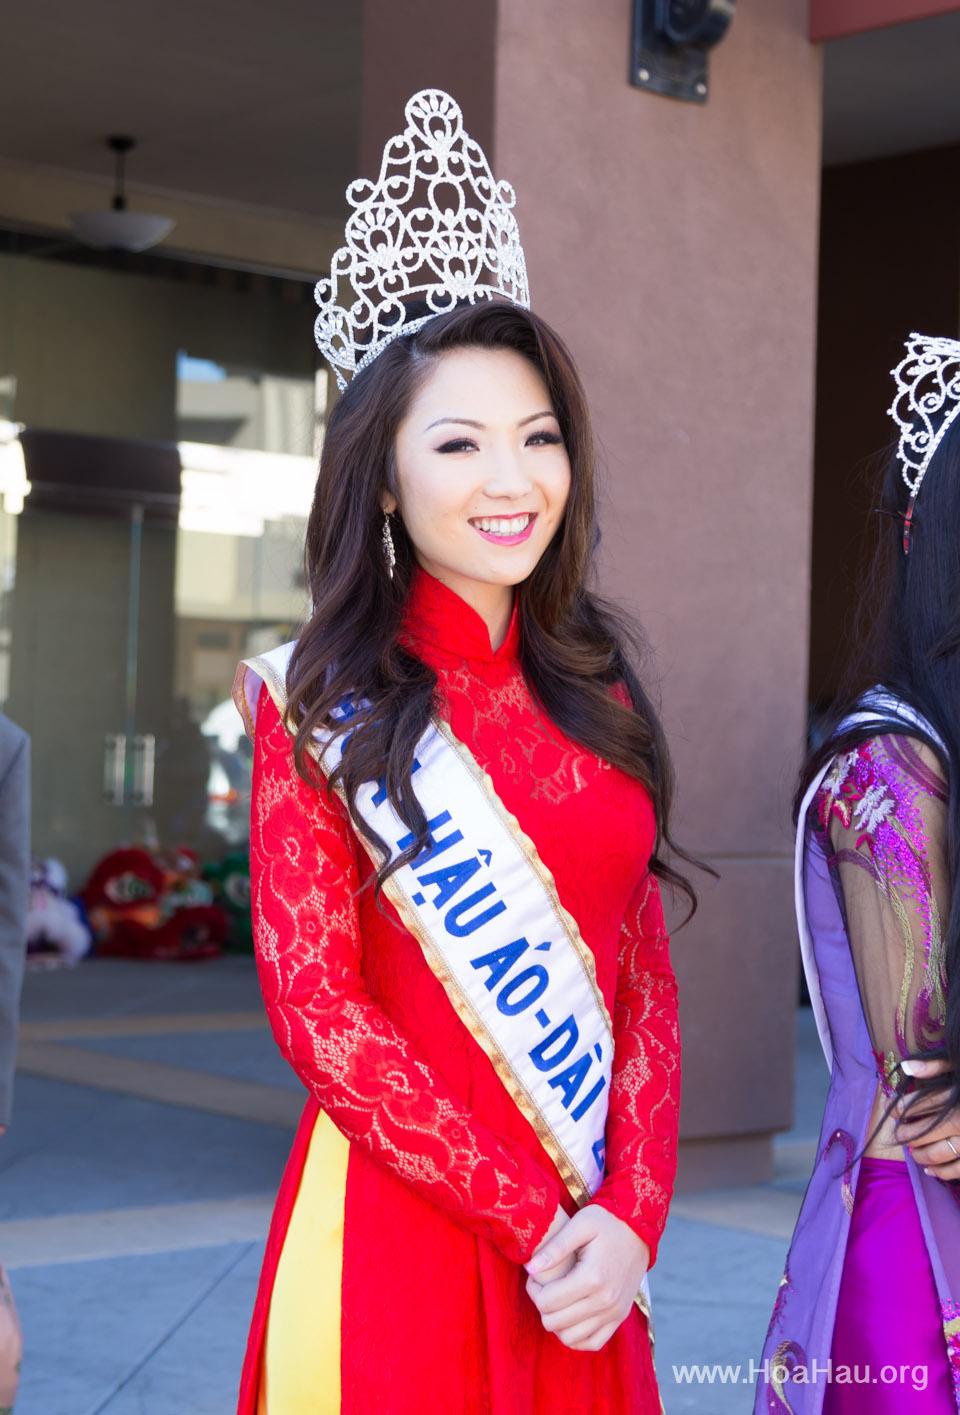 Tet Festival 2014 at Vietnam Town - Hoa Hau - Miss Vietnam - Image 144